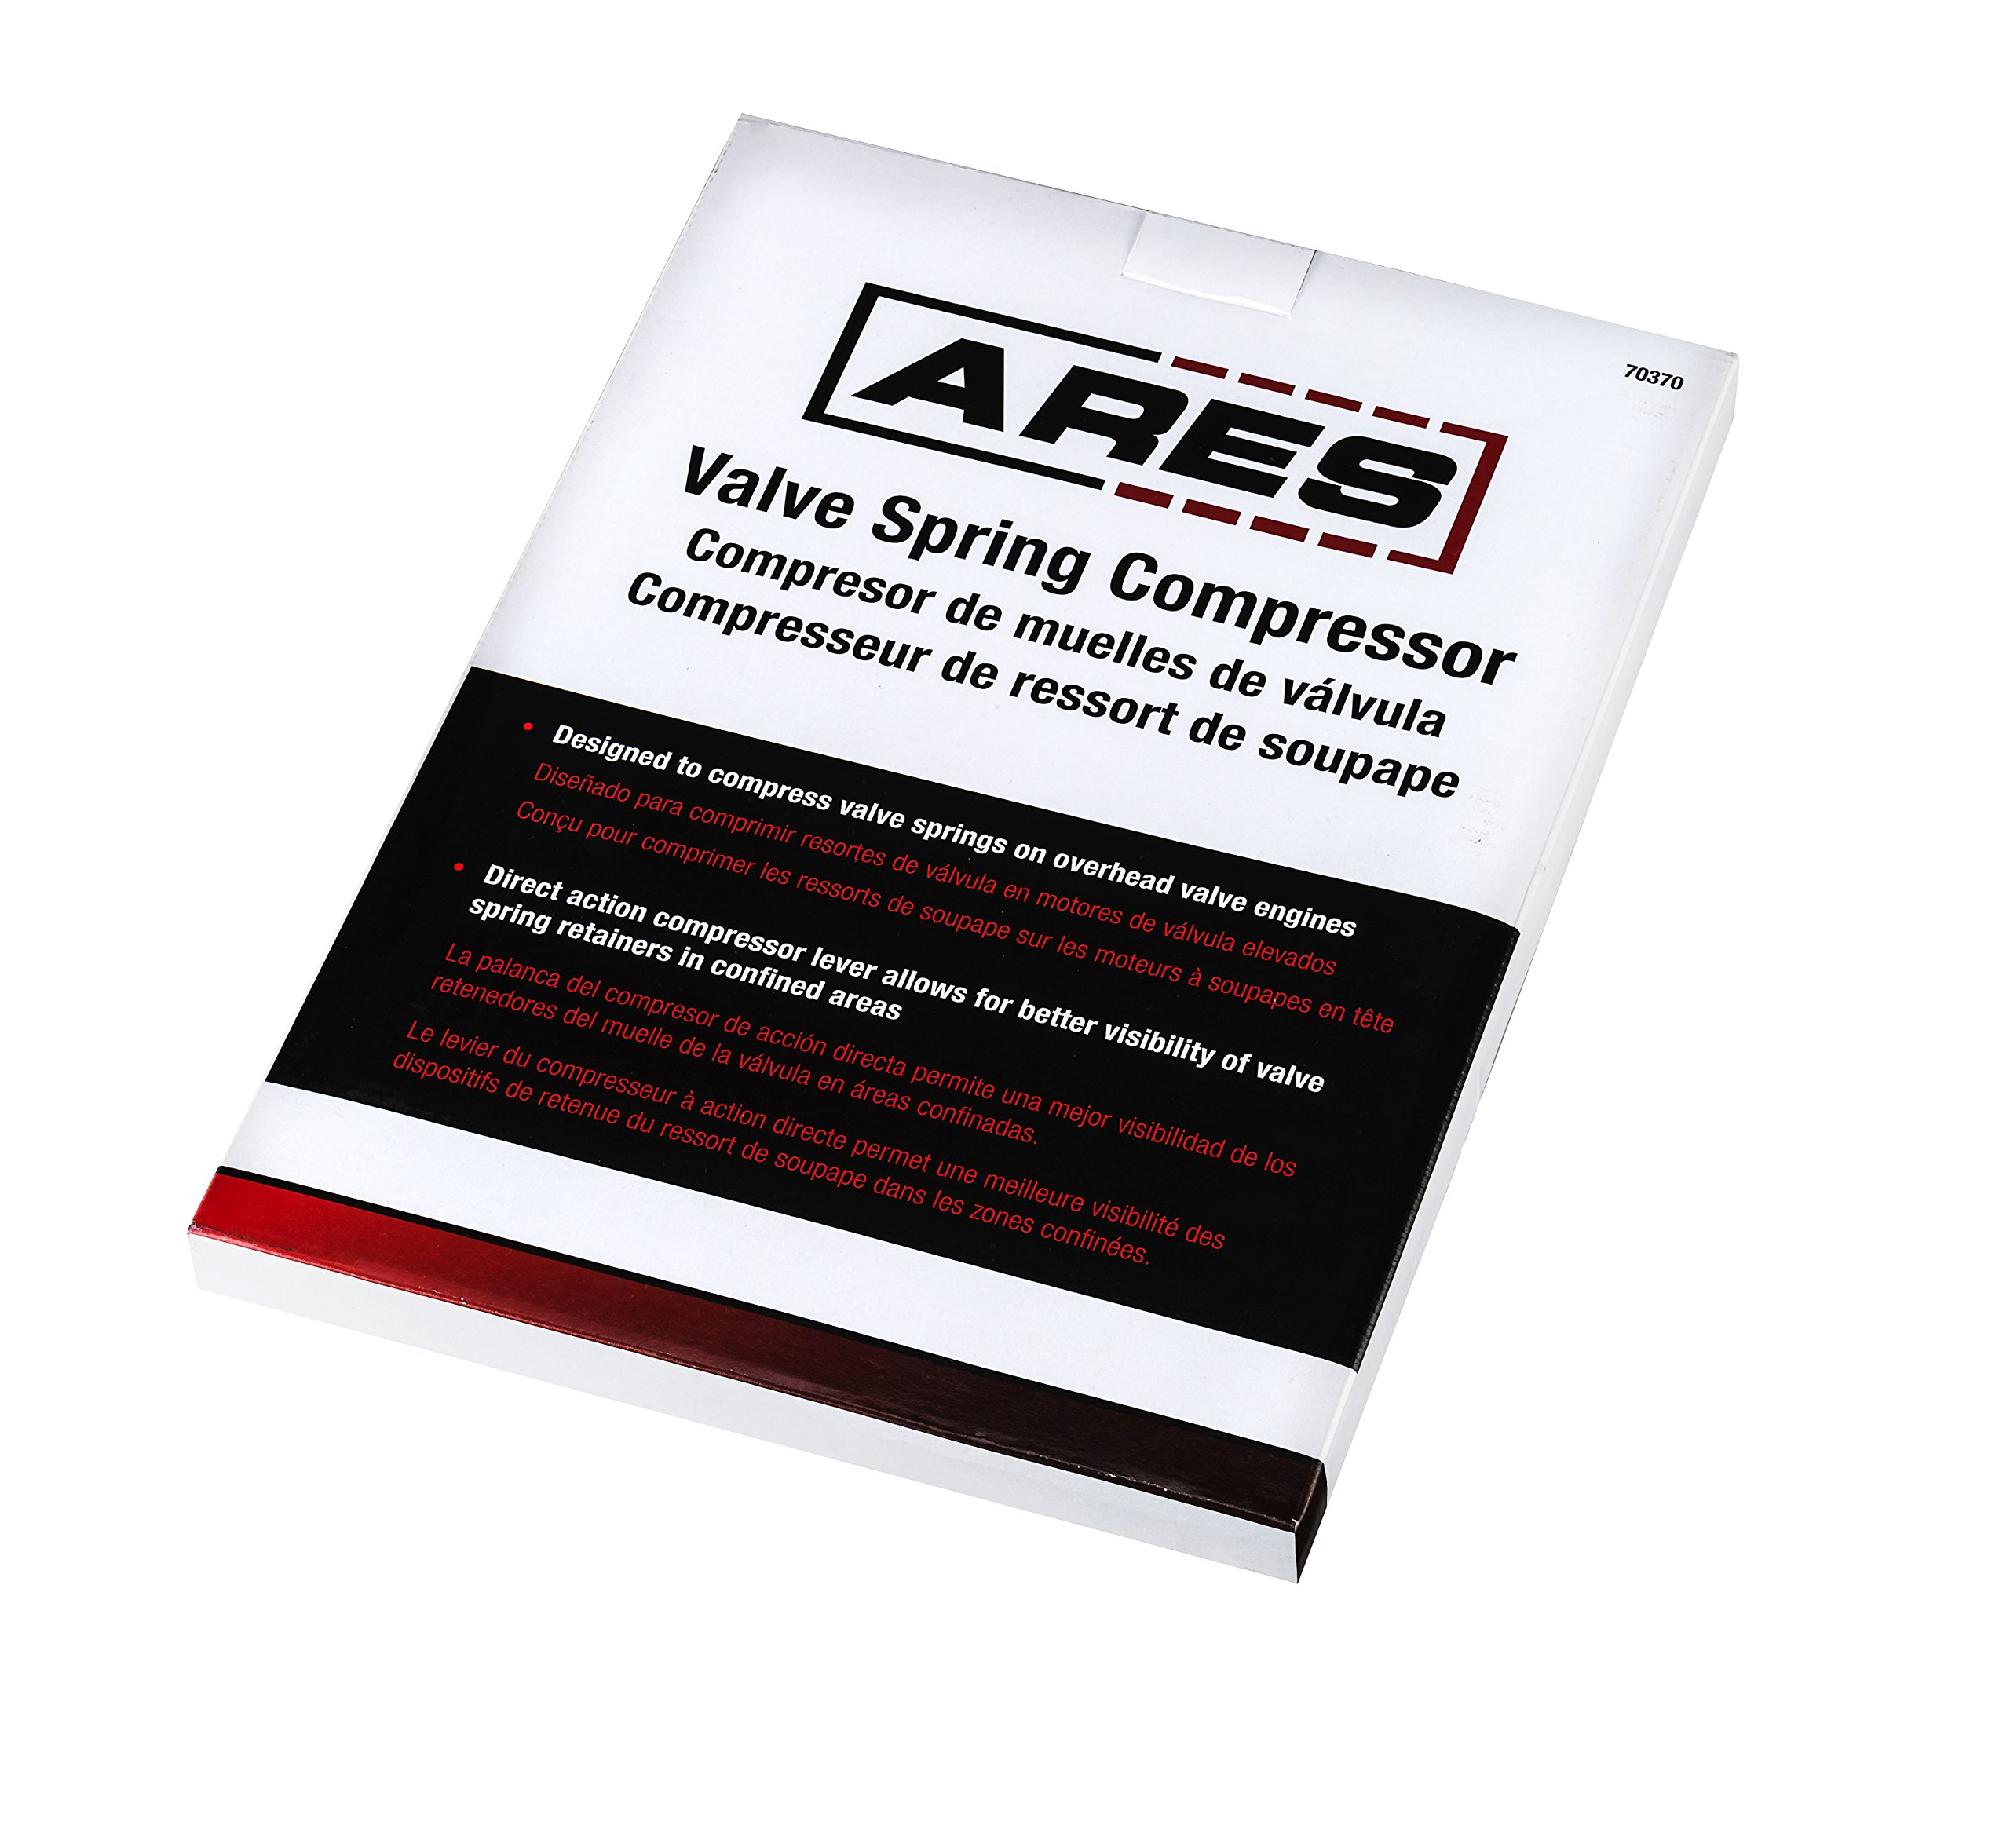 ARES 70370   Valve Spring Compressor   Compresses Valve Springs on Overhead Valve Engines   Direct Action Compressor Lever Gives Better Visibility During Valve Spring Compression by ARES (Image #5)